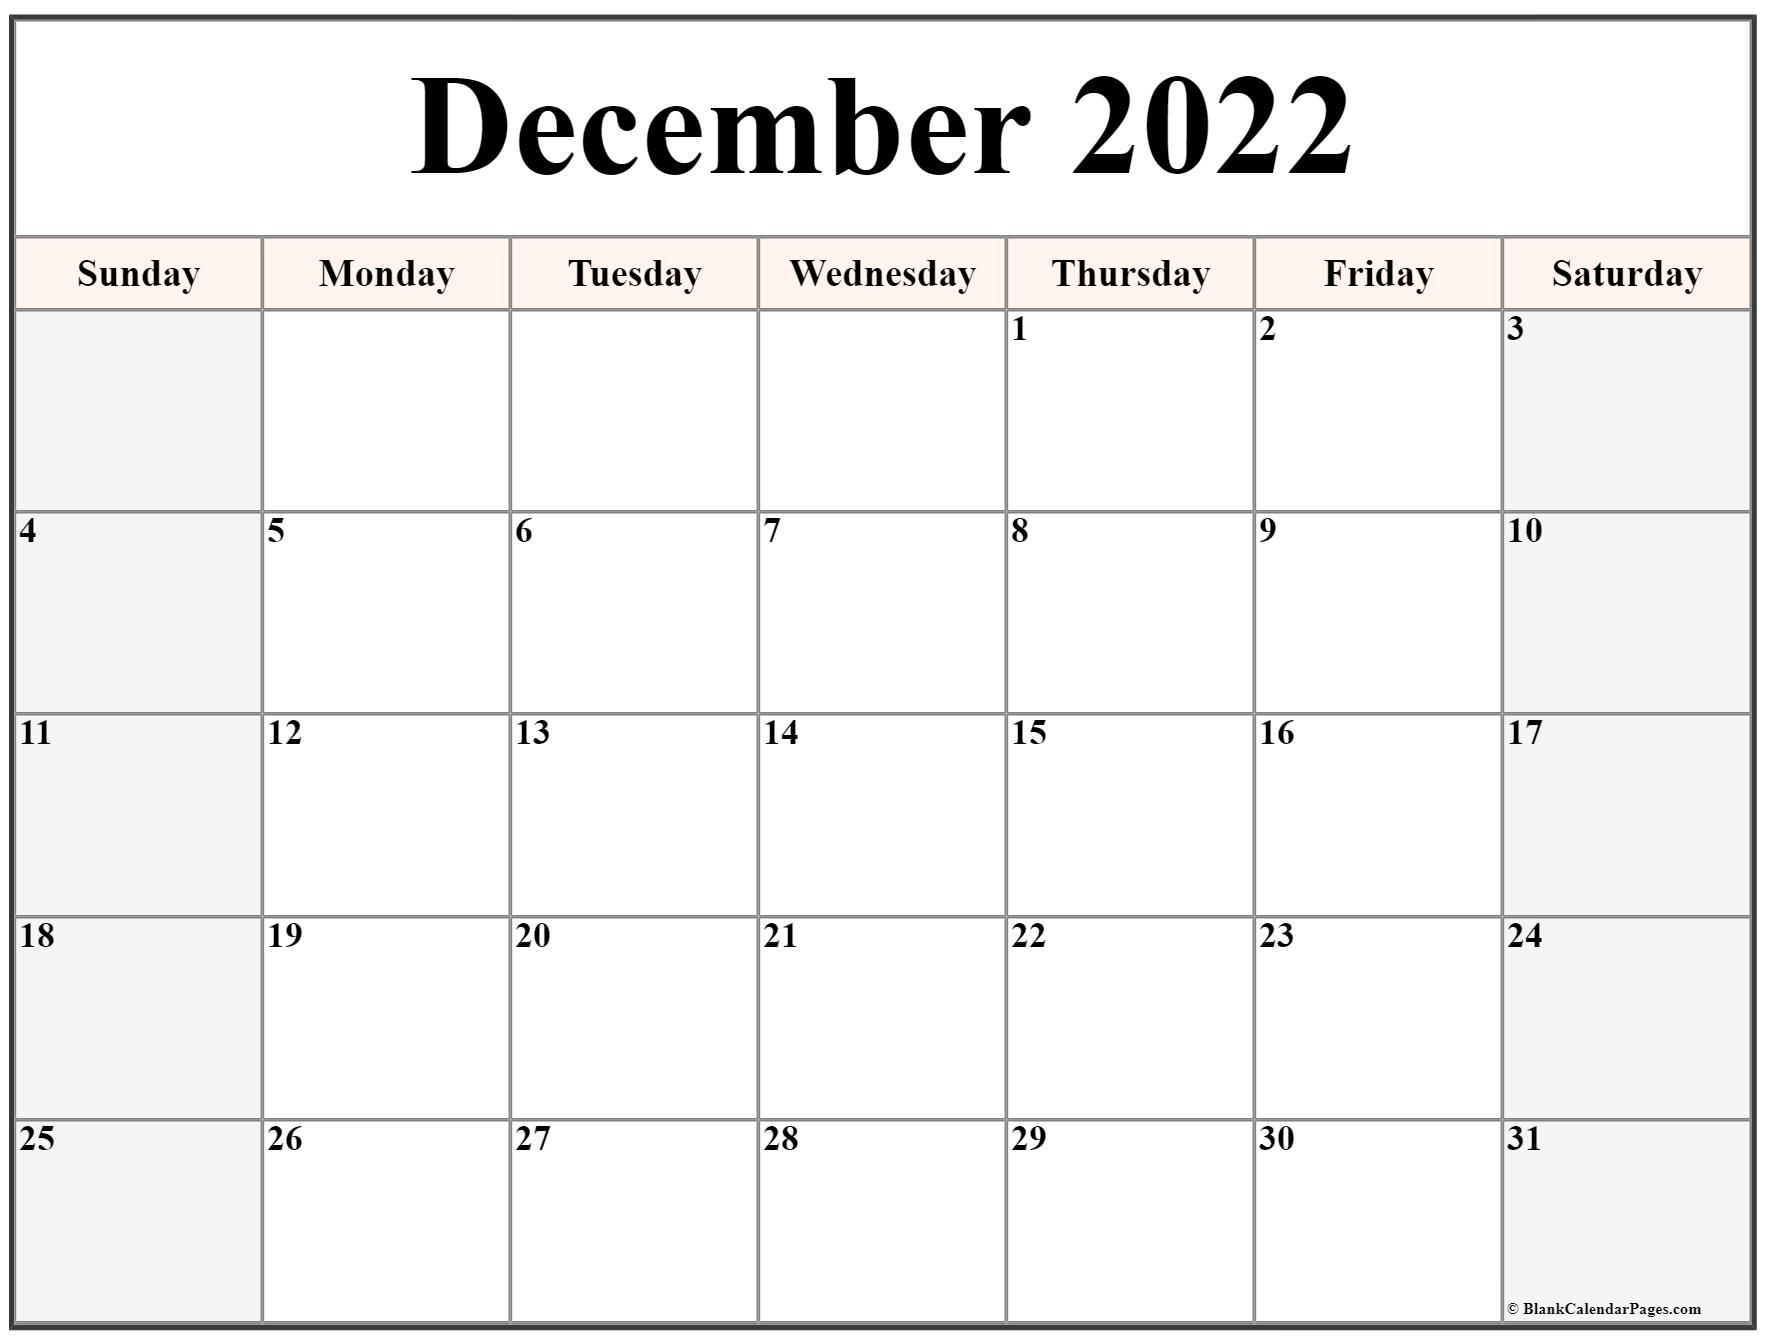 December 2022 calendar | free printable calendar templates